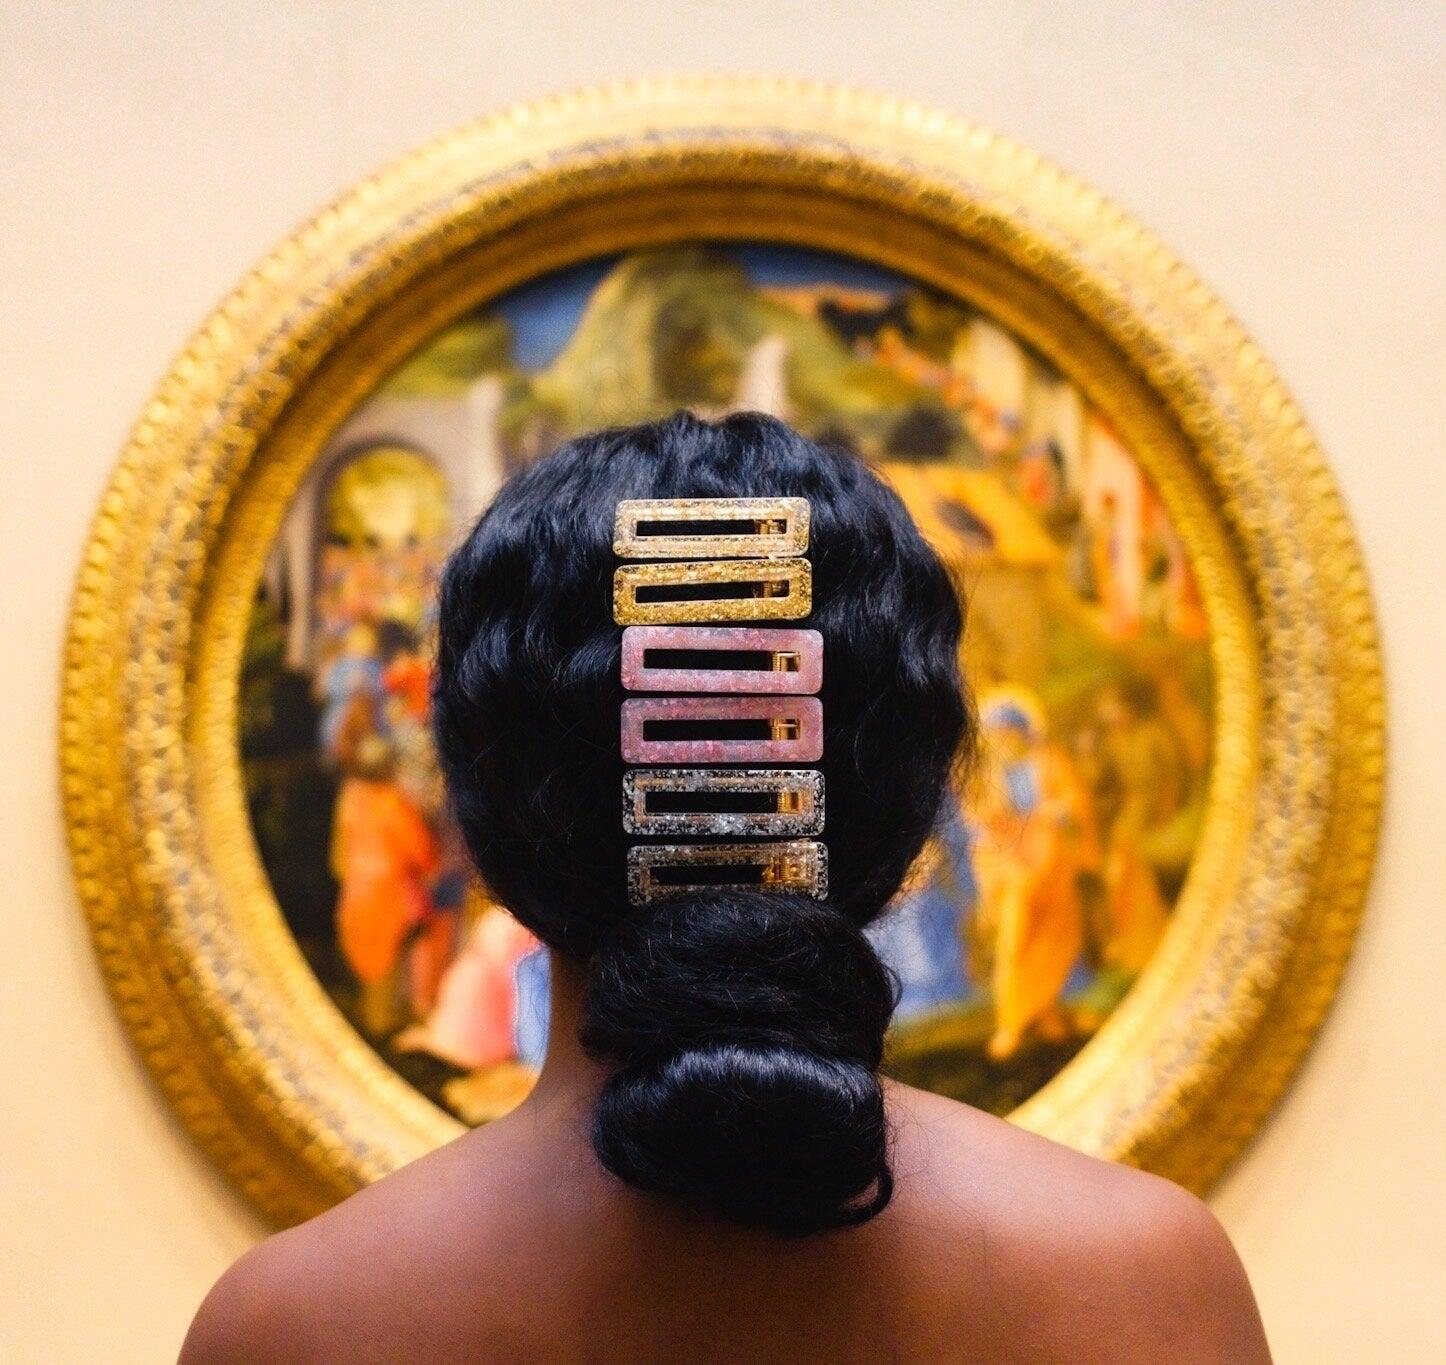 model wears multi-colored glittery hair clips in hair above low bun